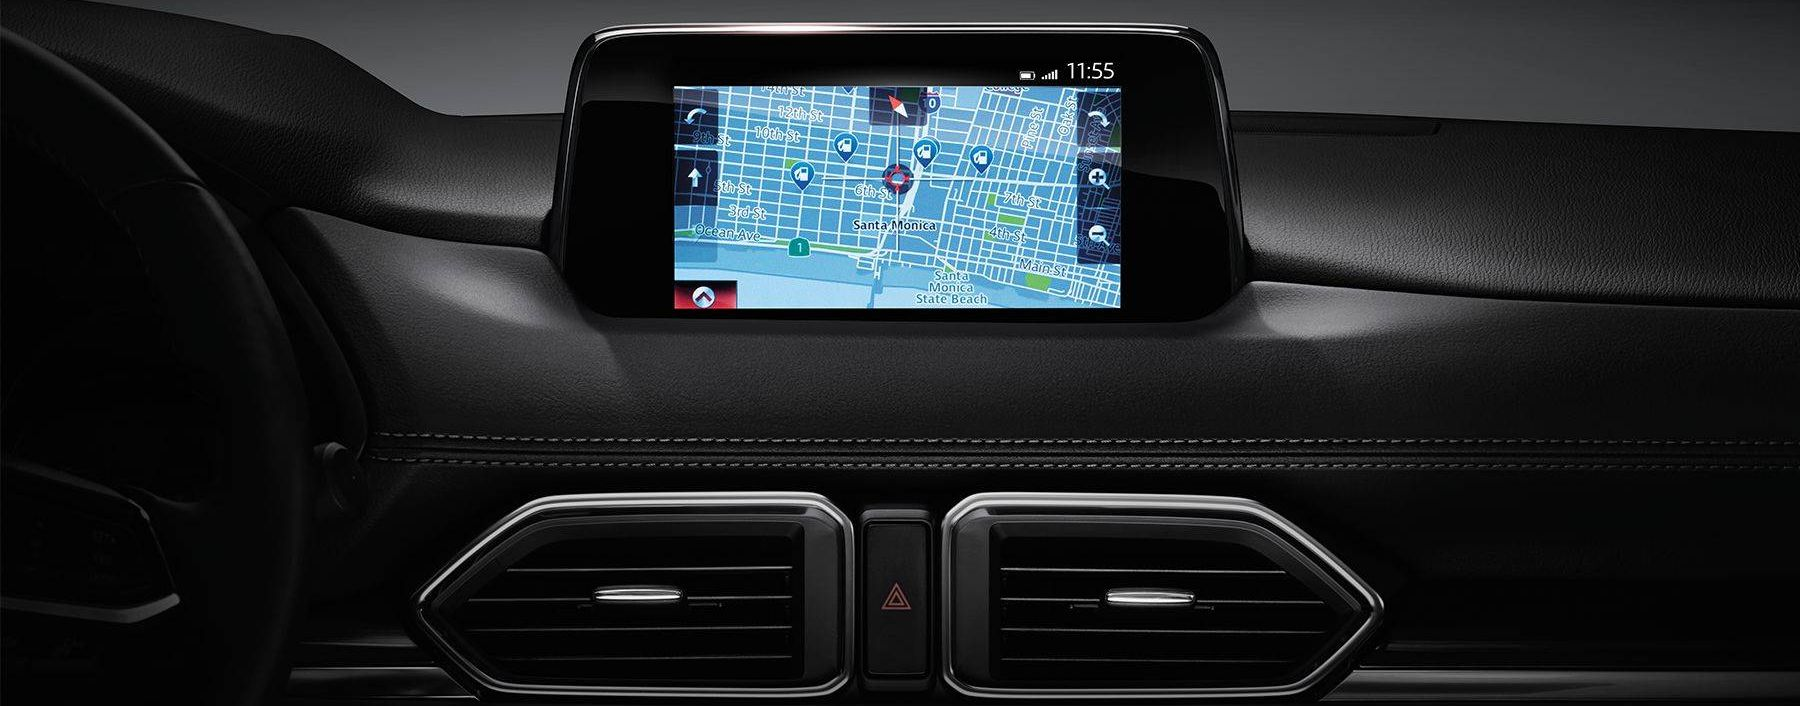 Mazda CX-5 Touchscreen